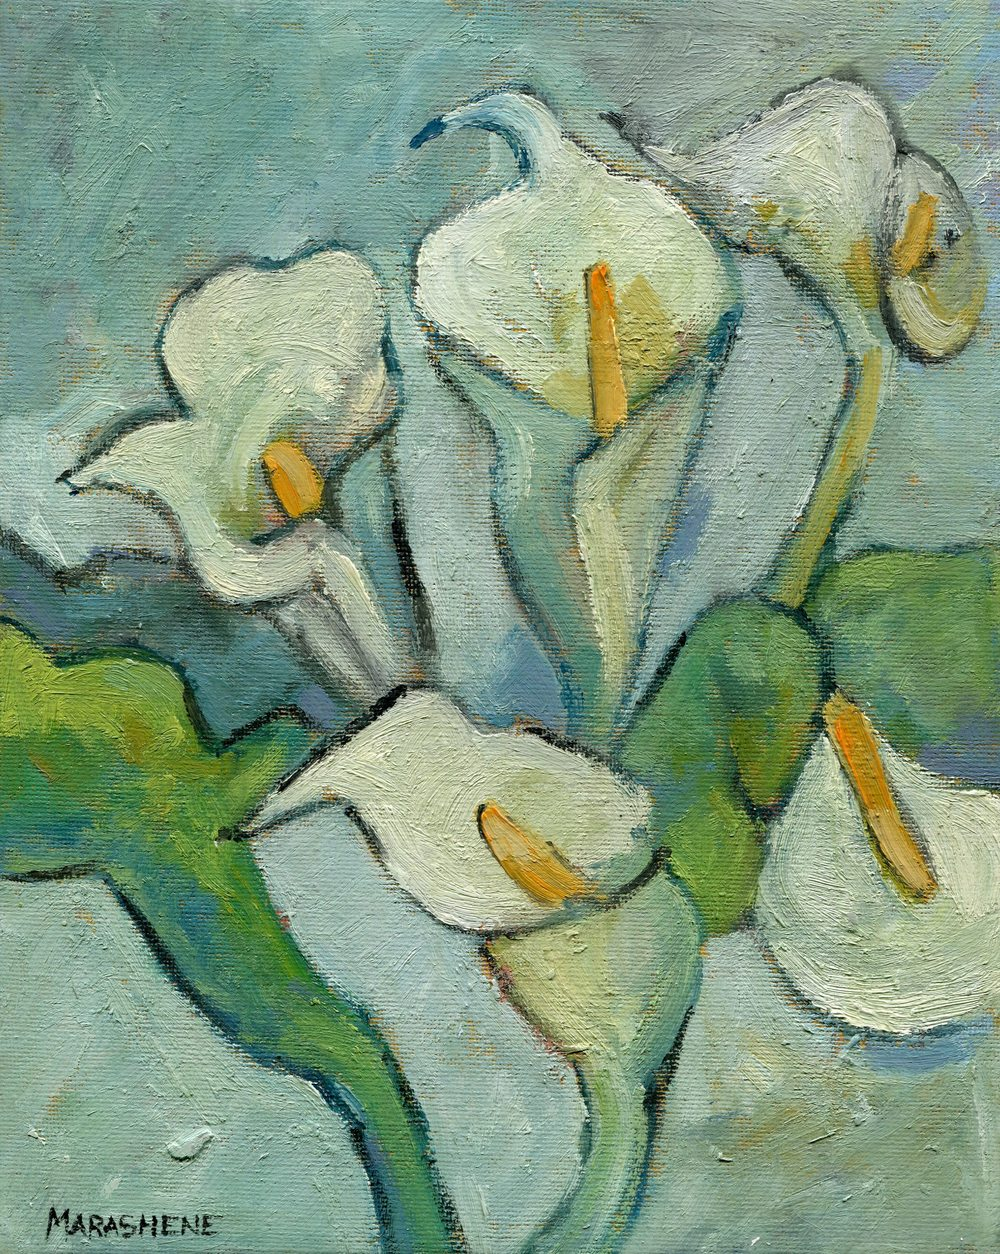 16a Lewis, Marashene-Arums,Oil on canvass.jpg